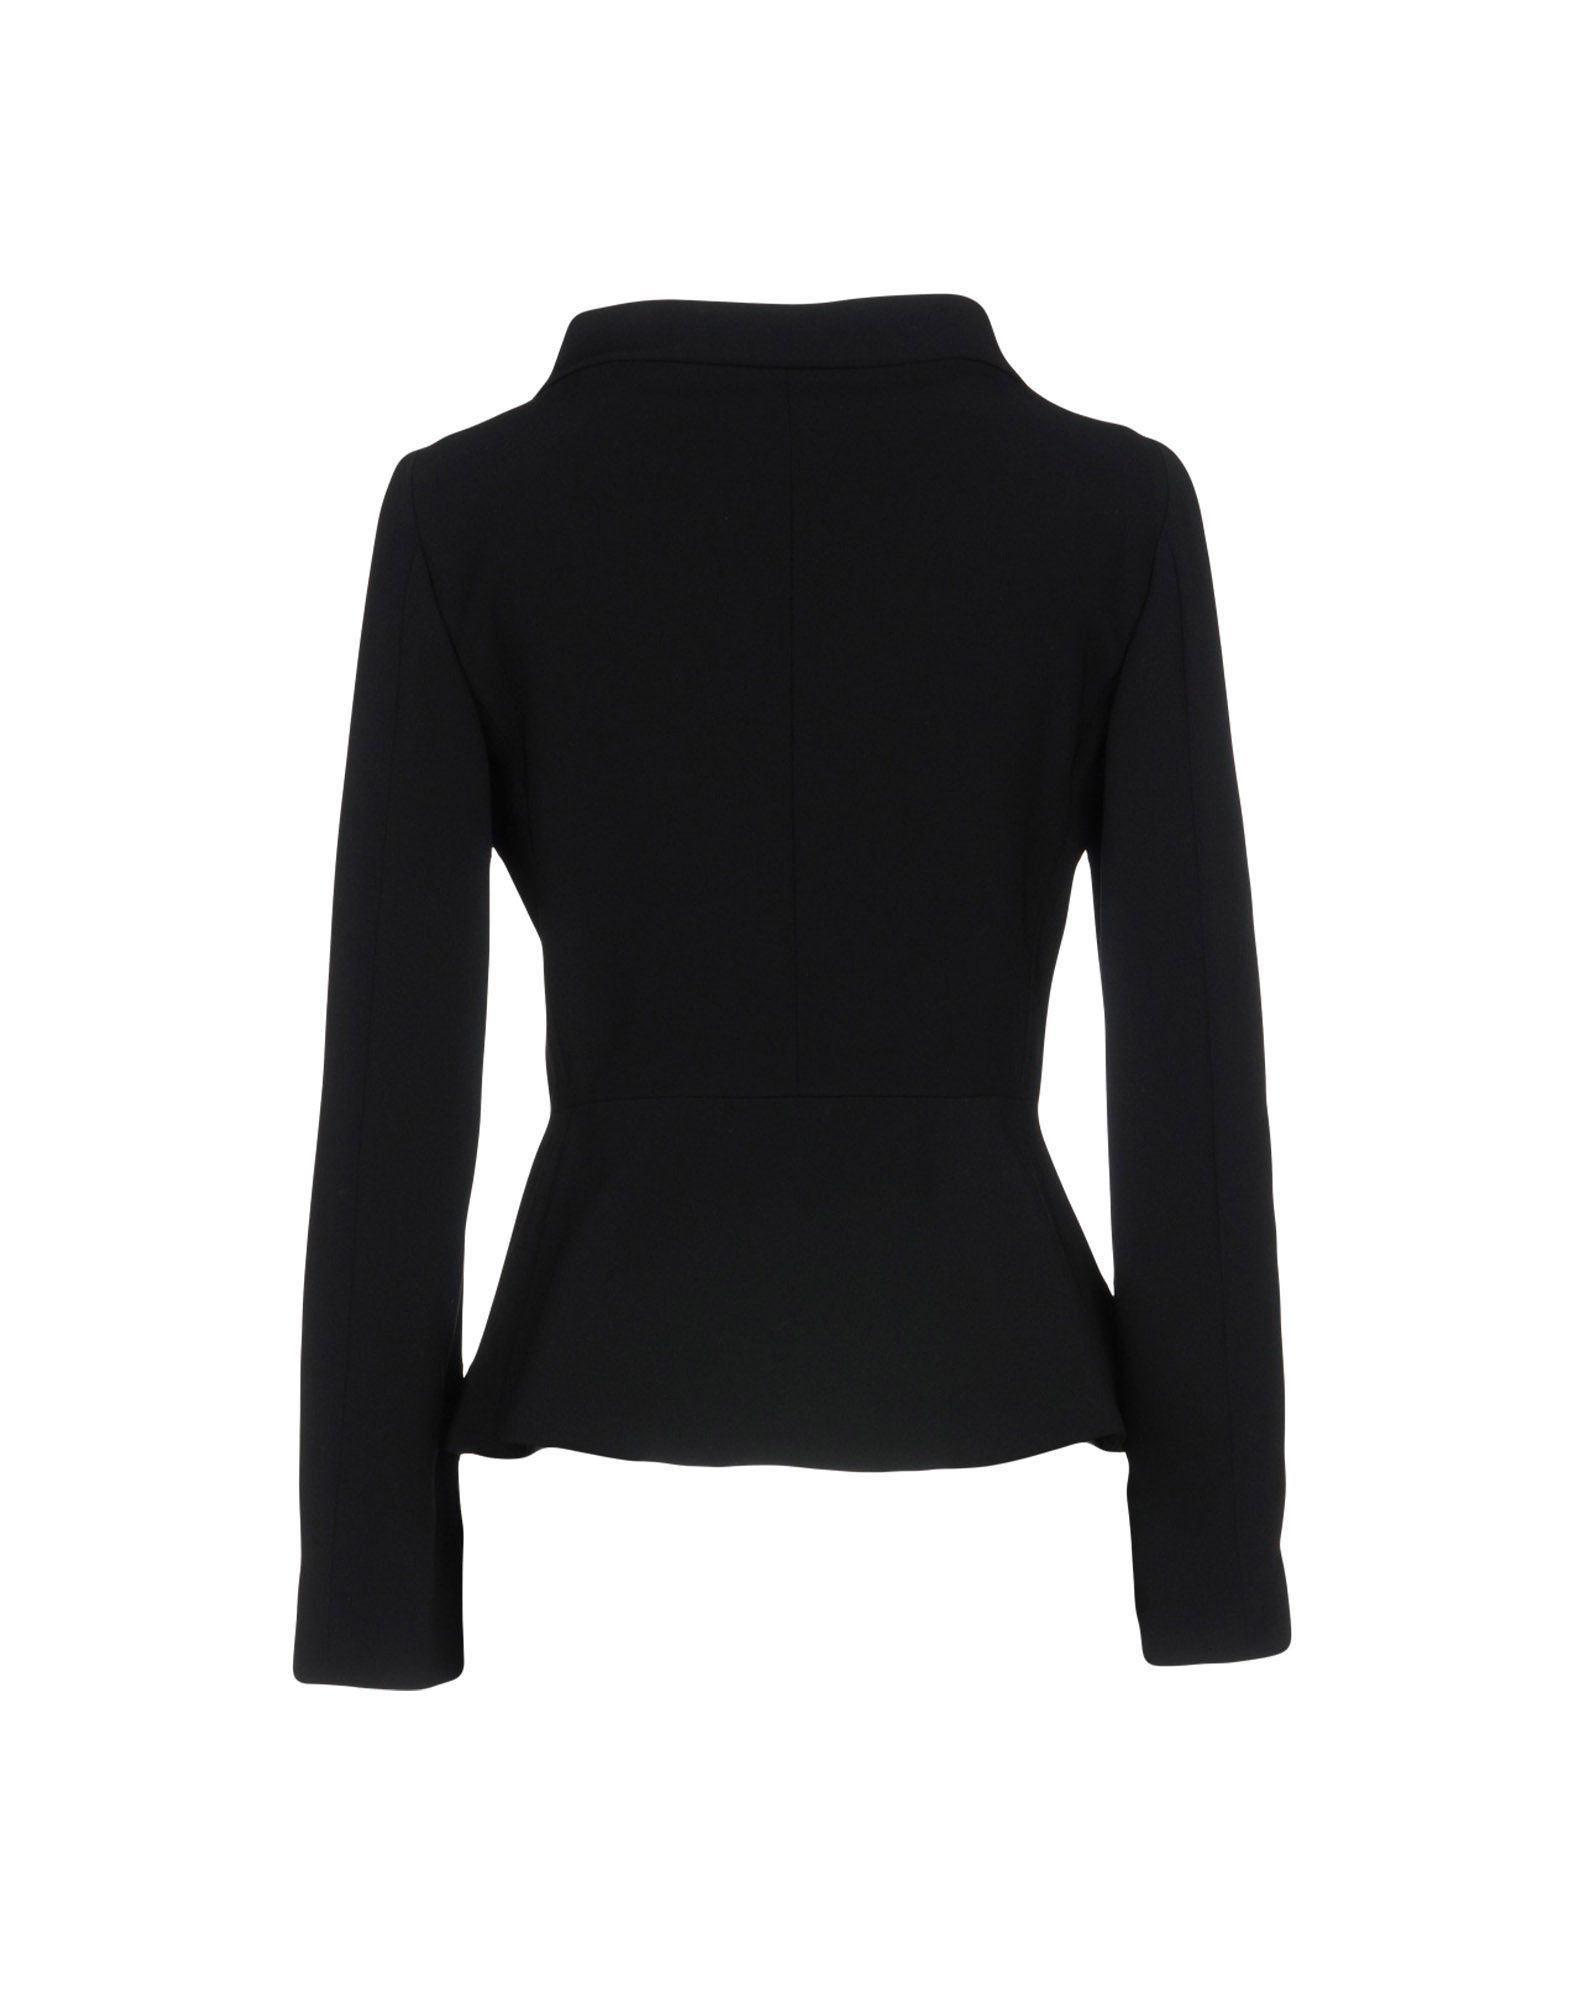 Boutique Moschino Black Crepe Jacket